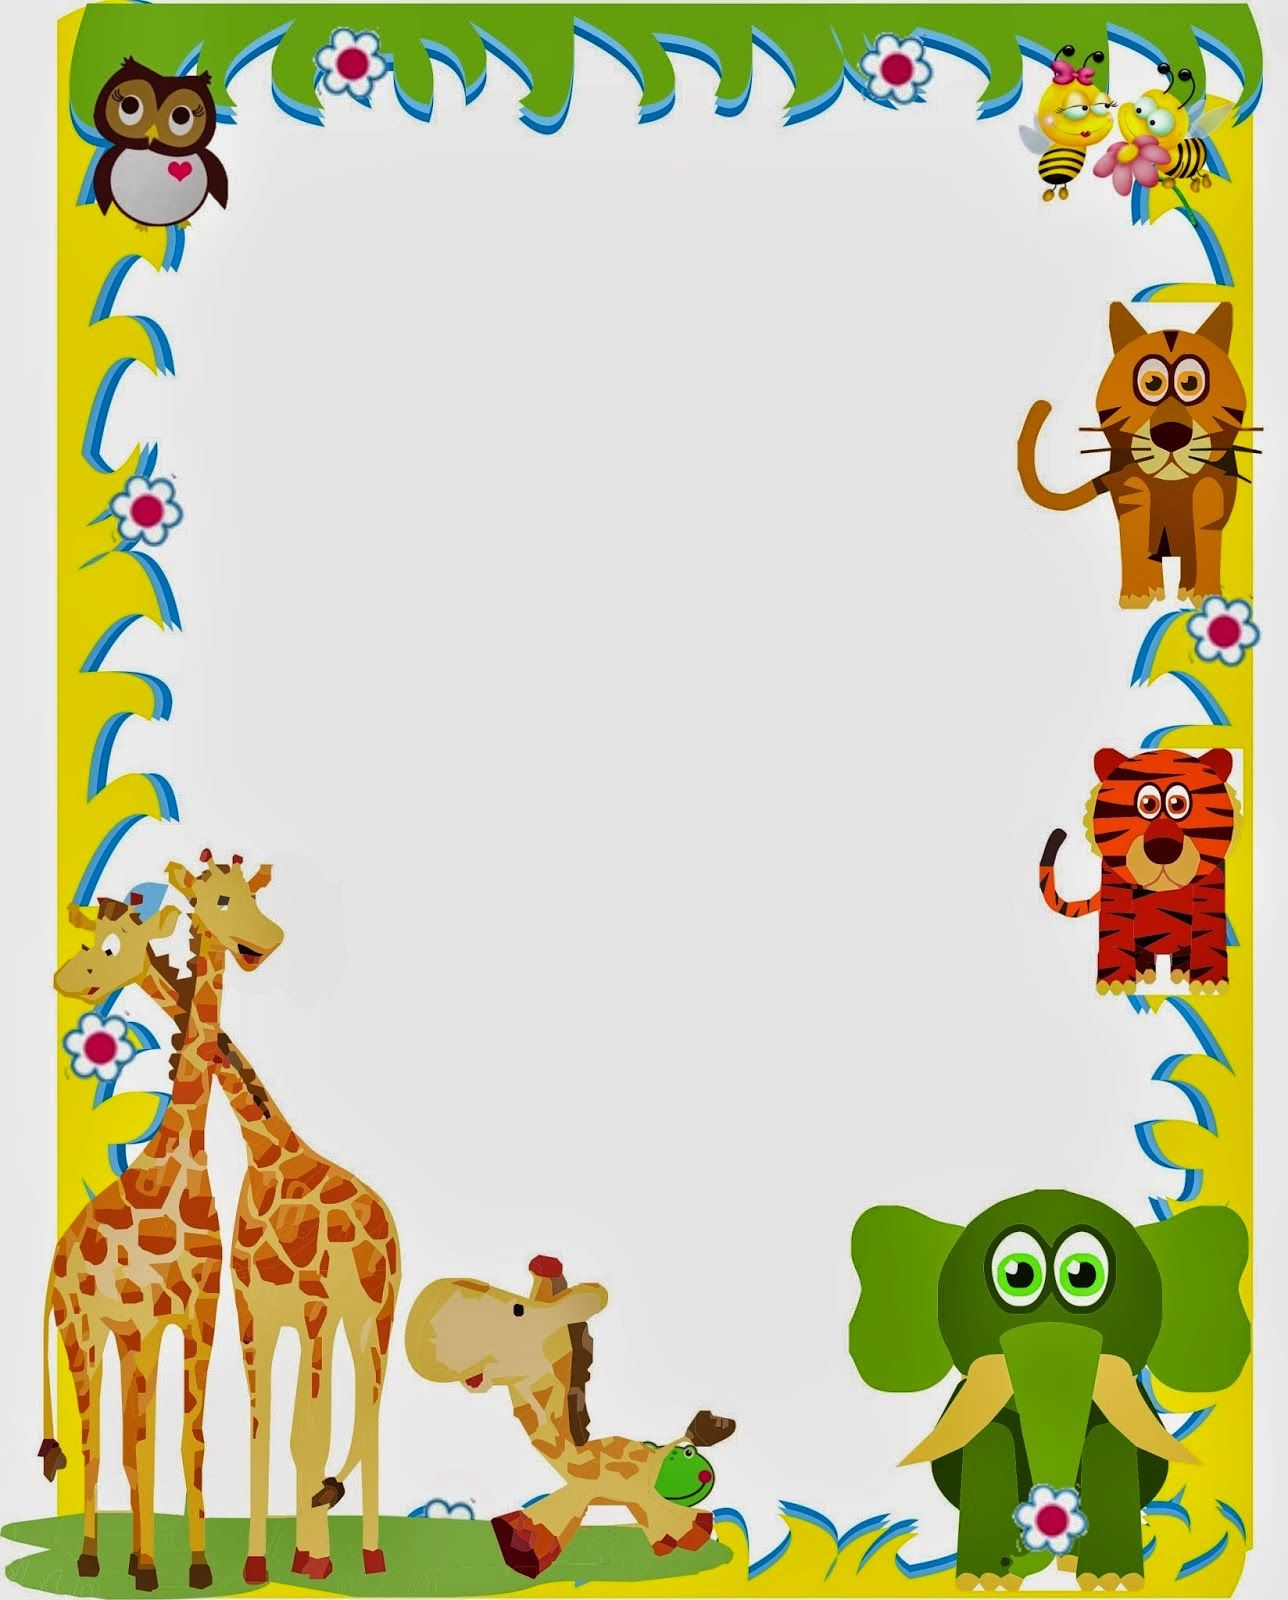 marcos para niños | jirafitas para caratulas | Pinterest | Para ...